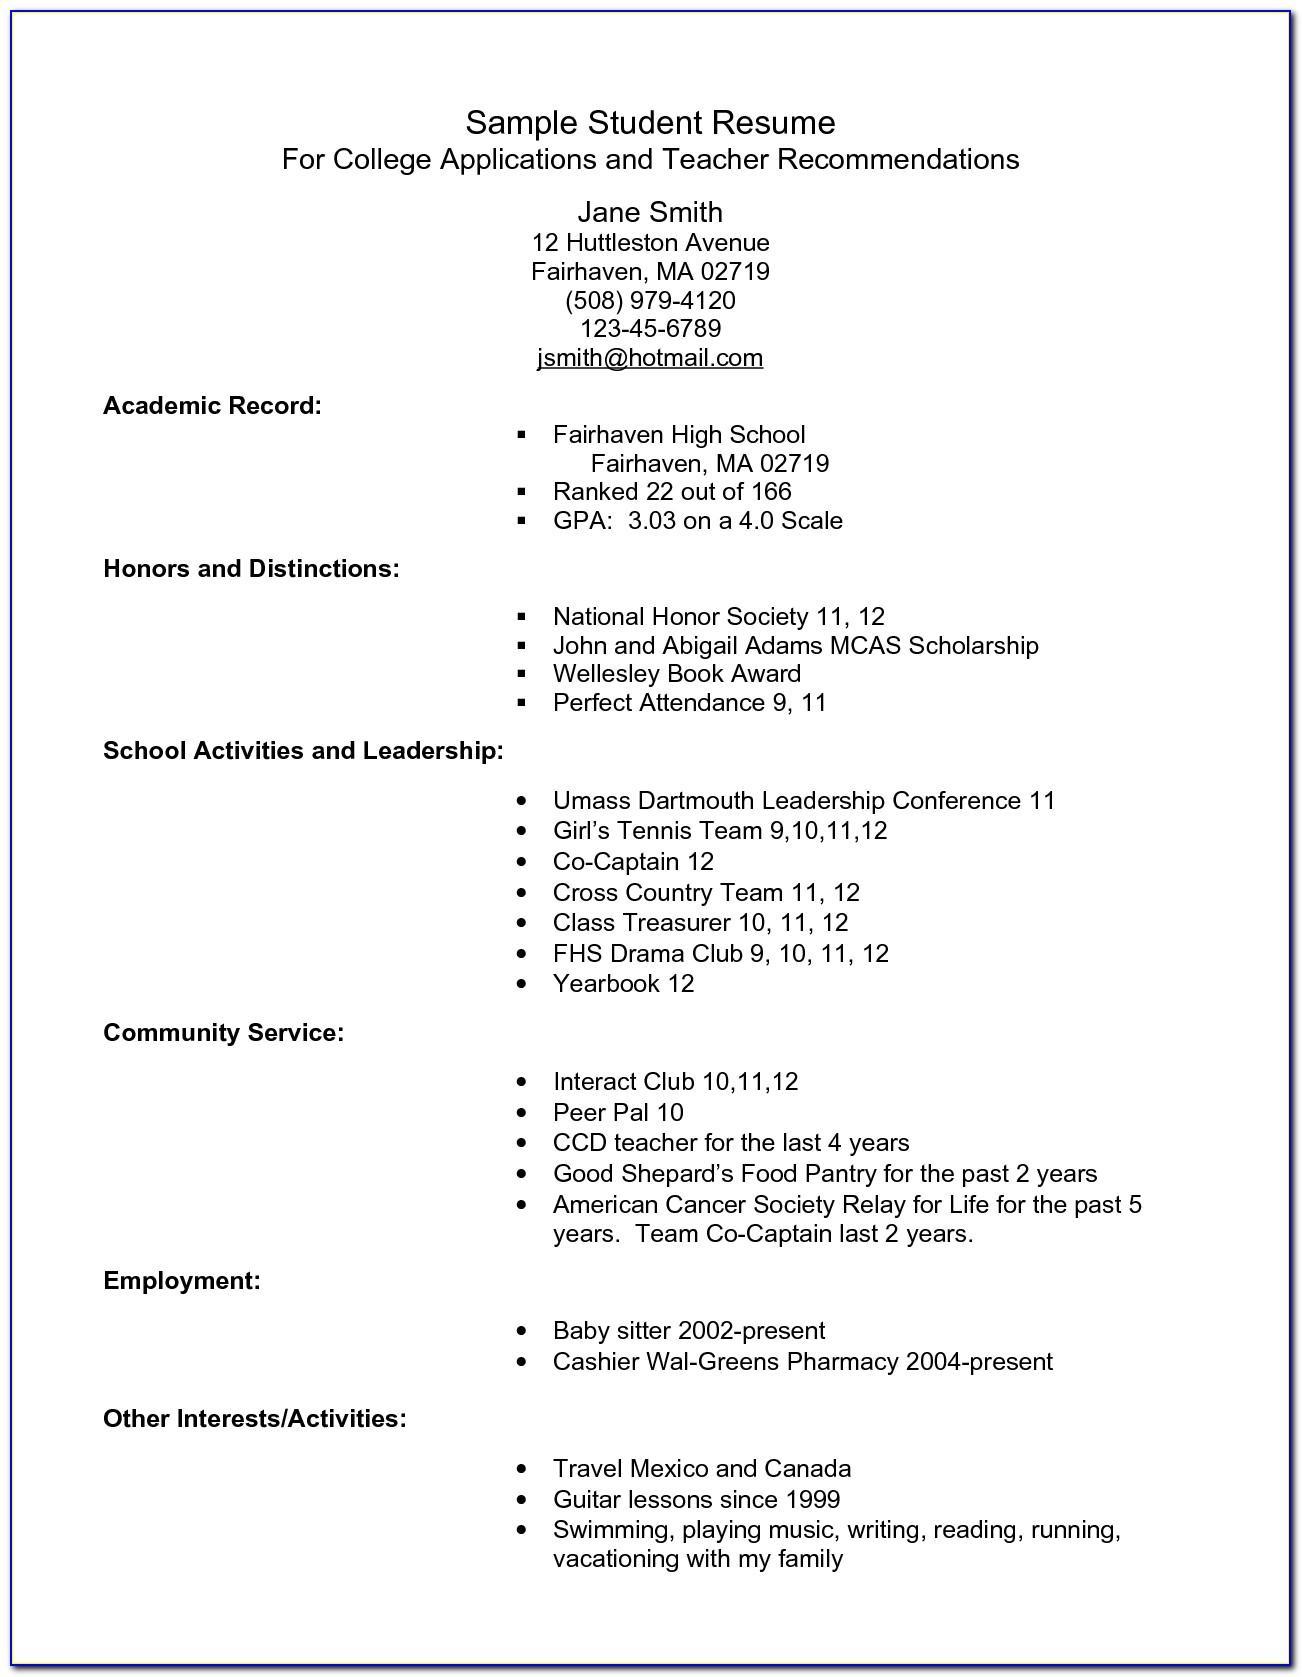 Sample Resume For College Admissions Coordinator